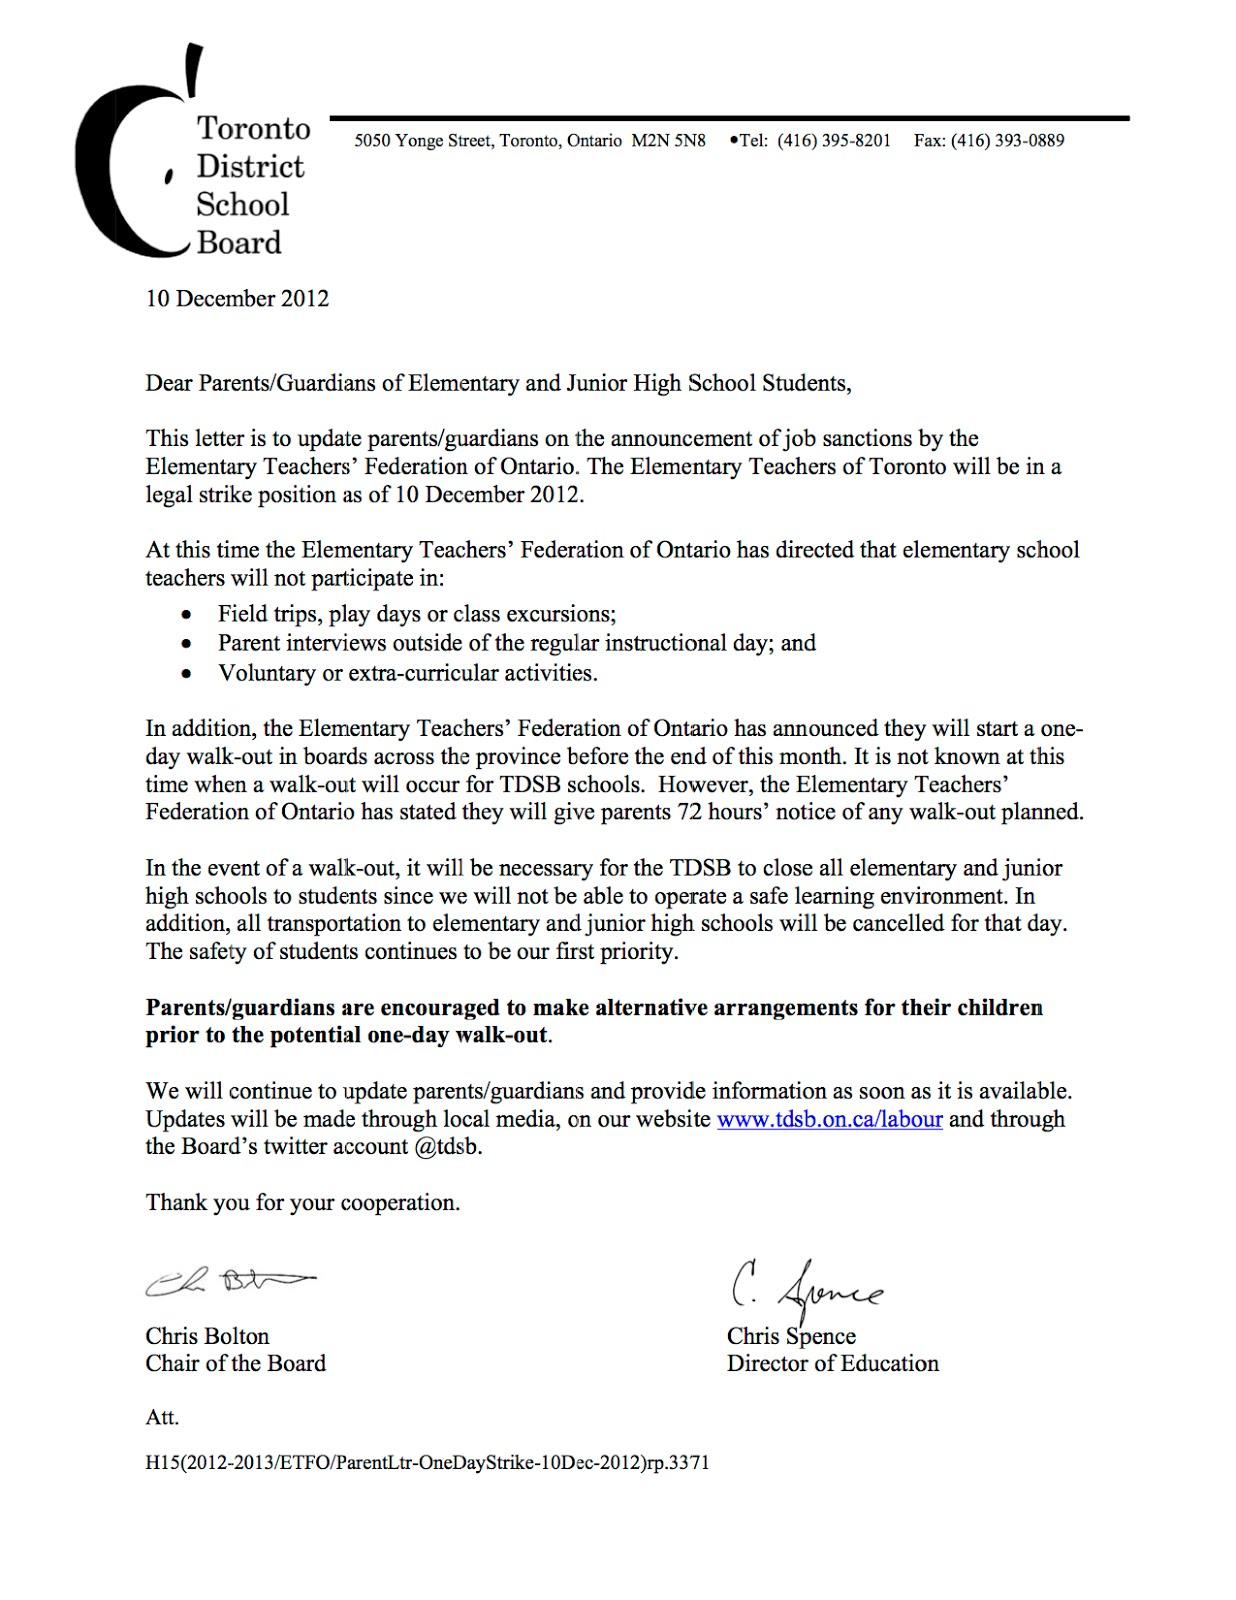 clairlea school council: no more field trips, excursions or extra